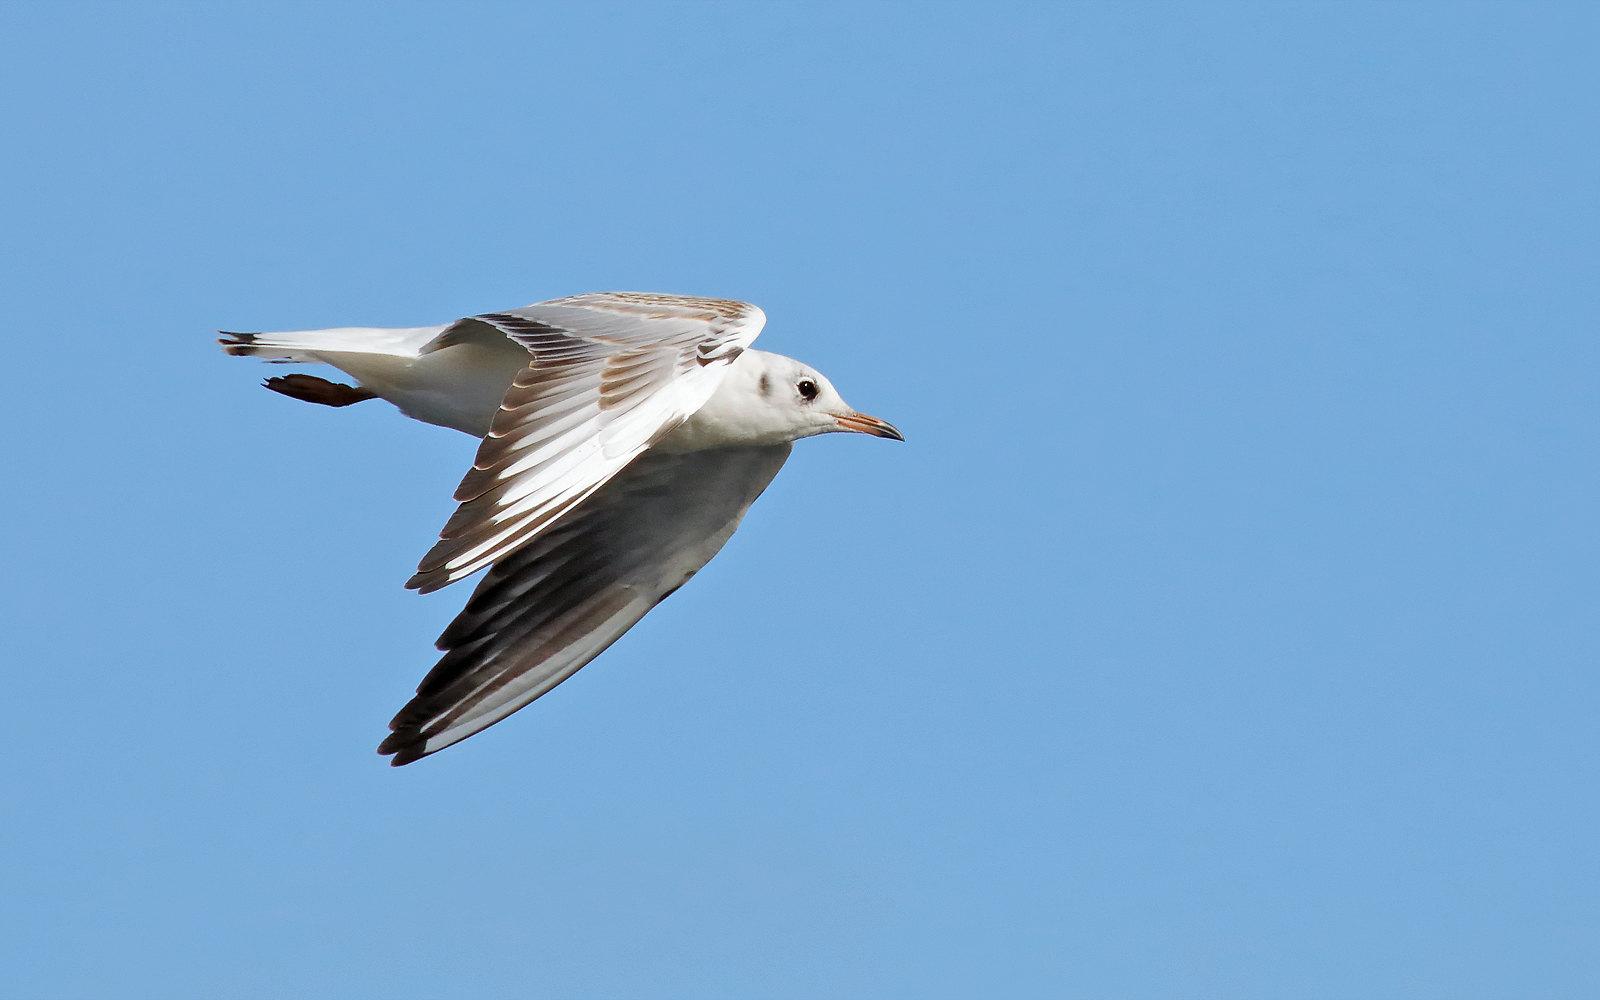 Black-headed Gull - Juvenile